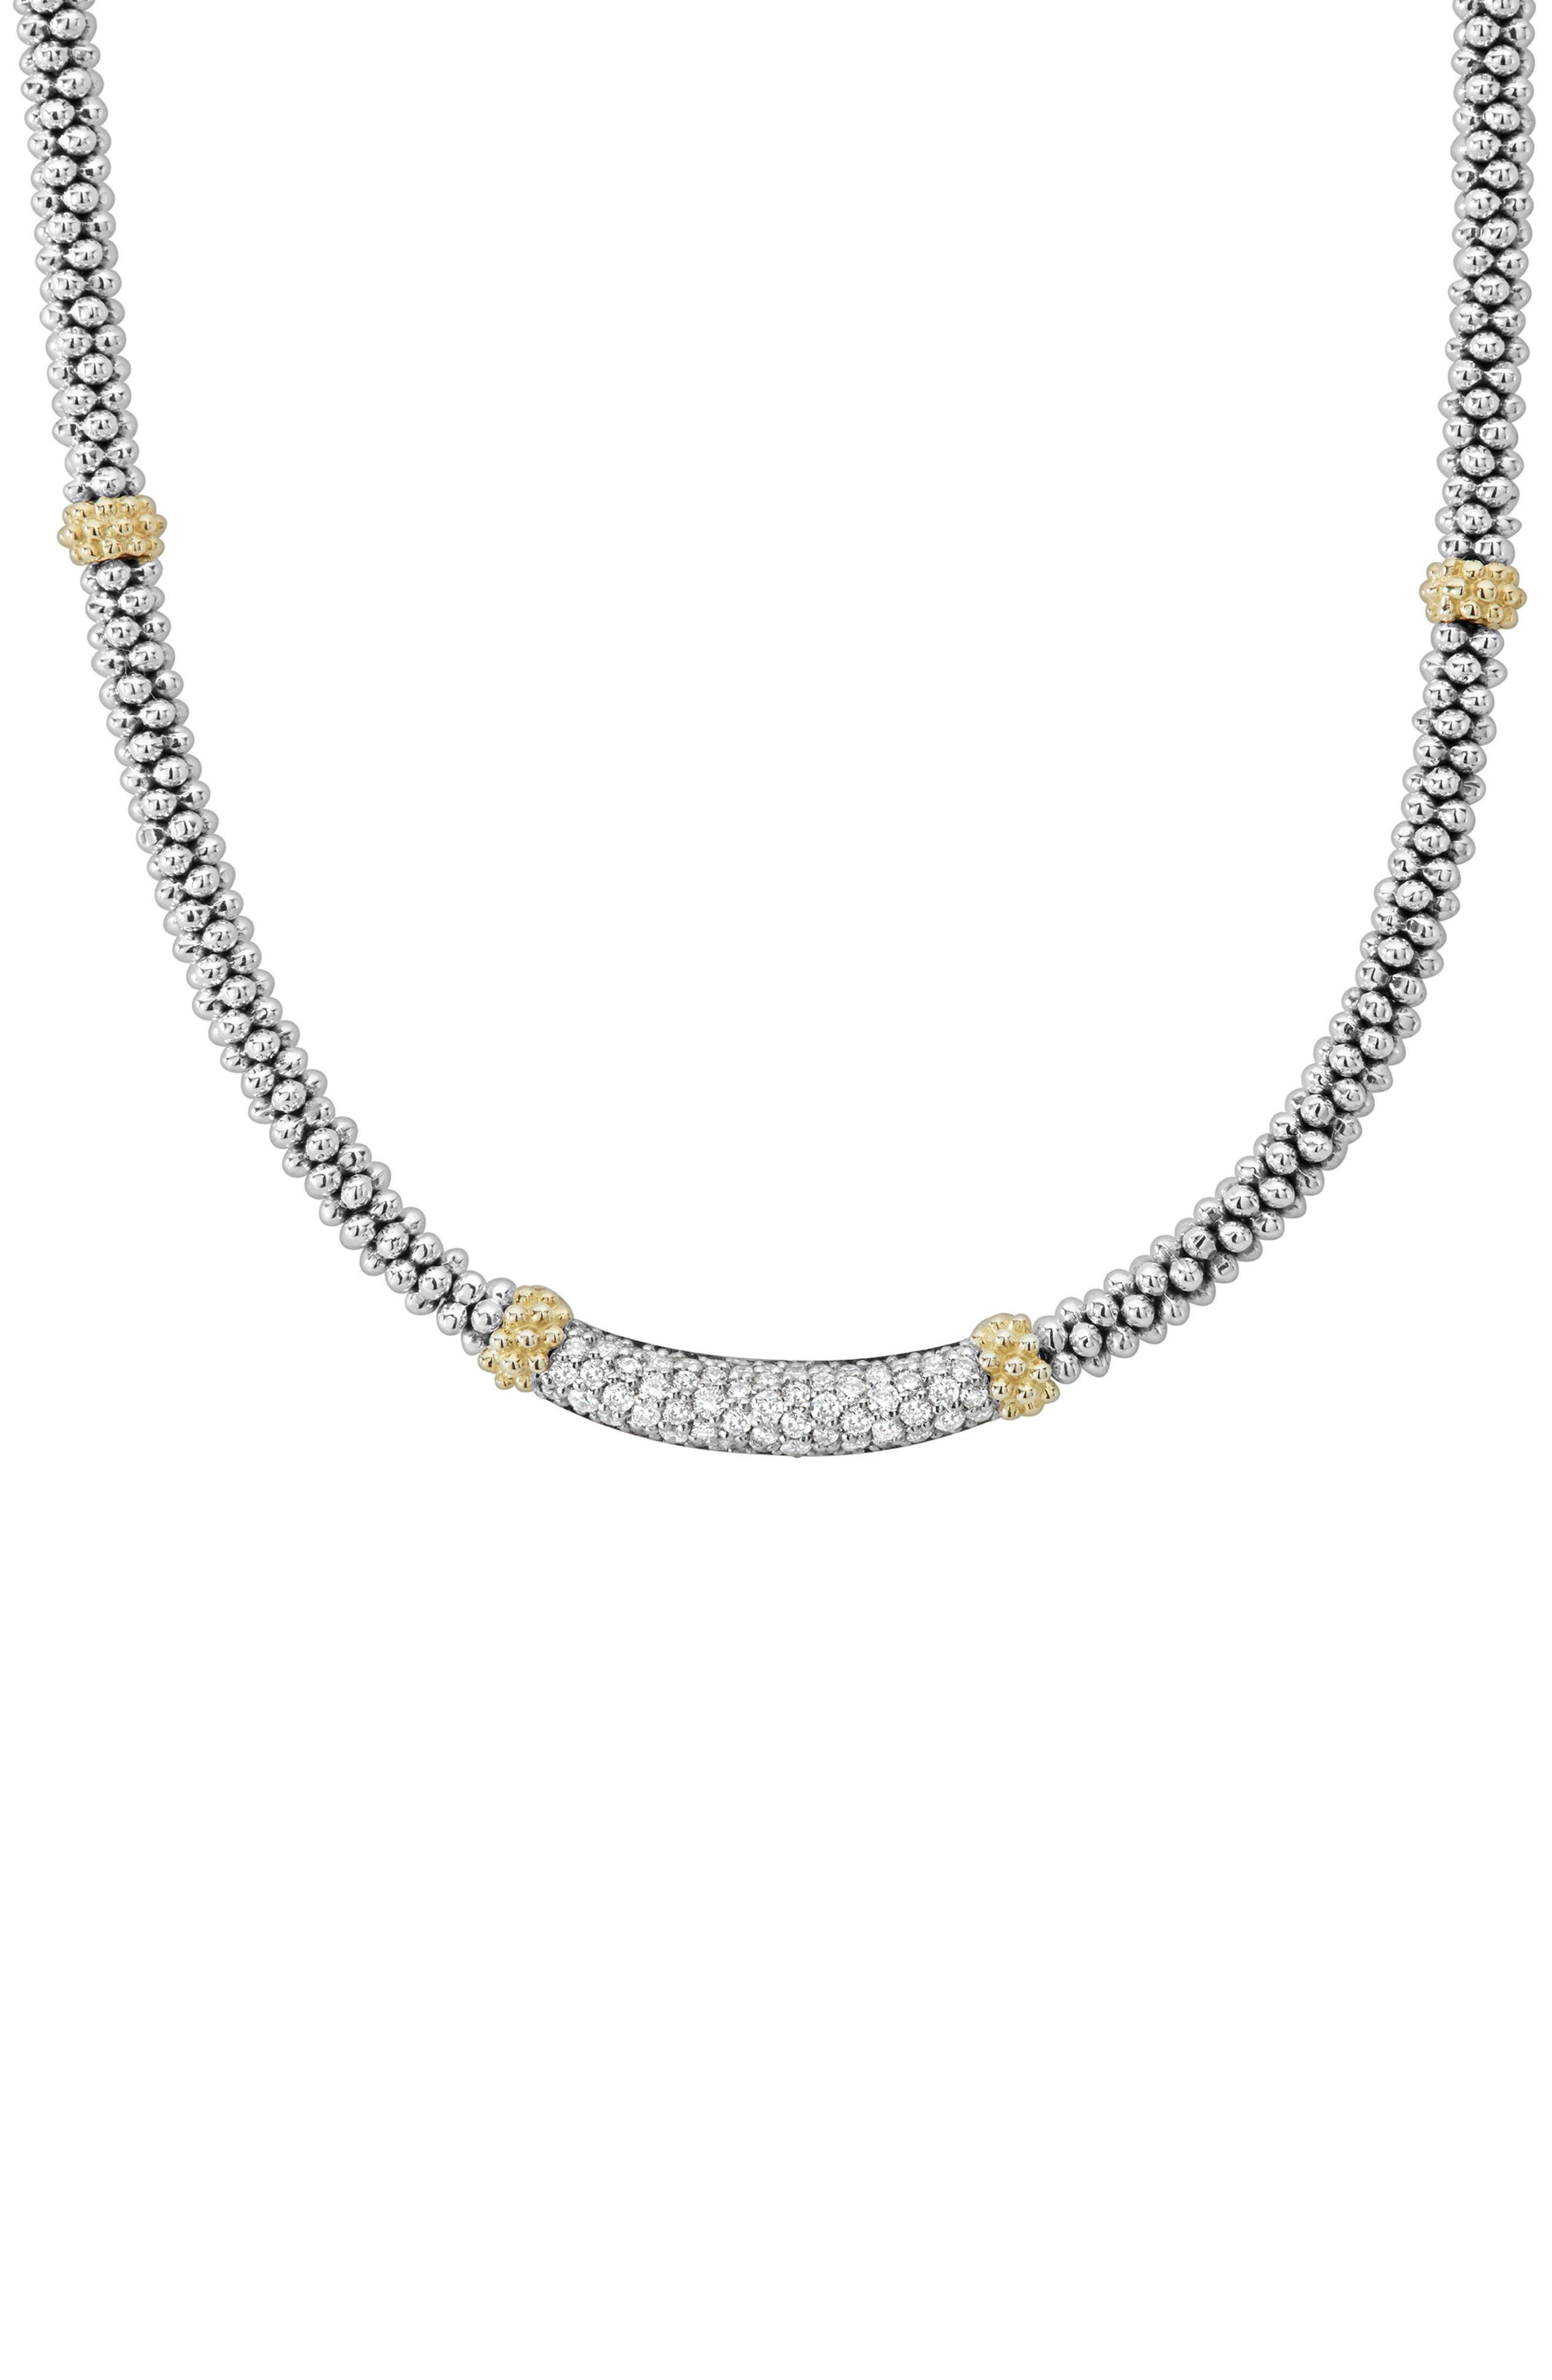 Lux Diamond Rope Necklace,                         Main,                         color, SILVER/ DIAMOND